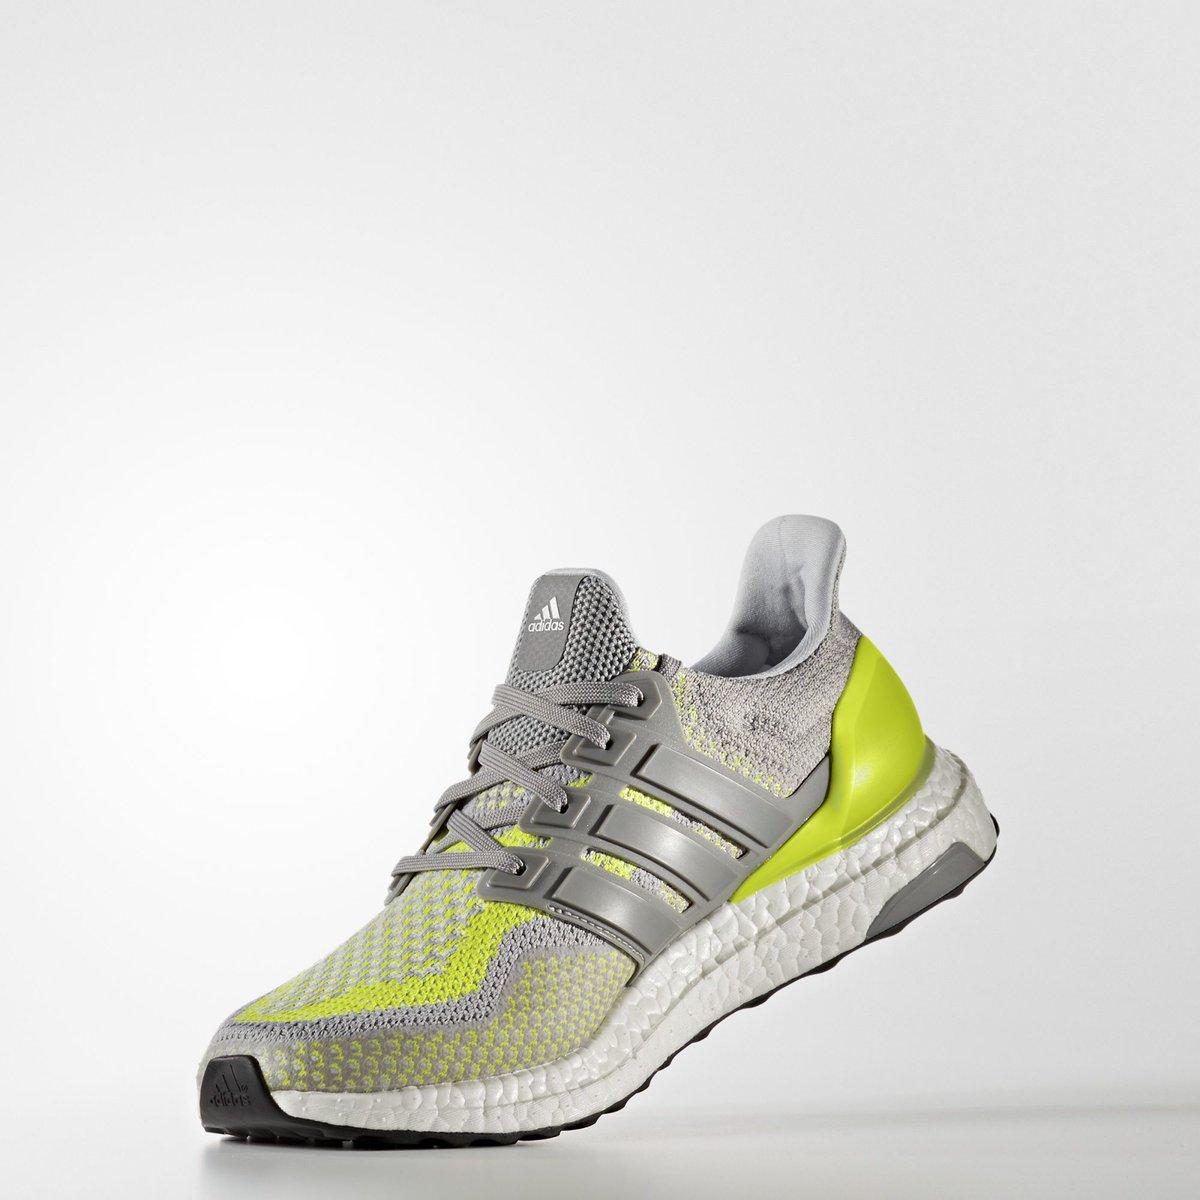 Adidas Inventory on Twitter